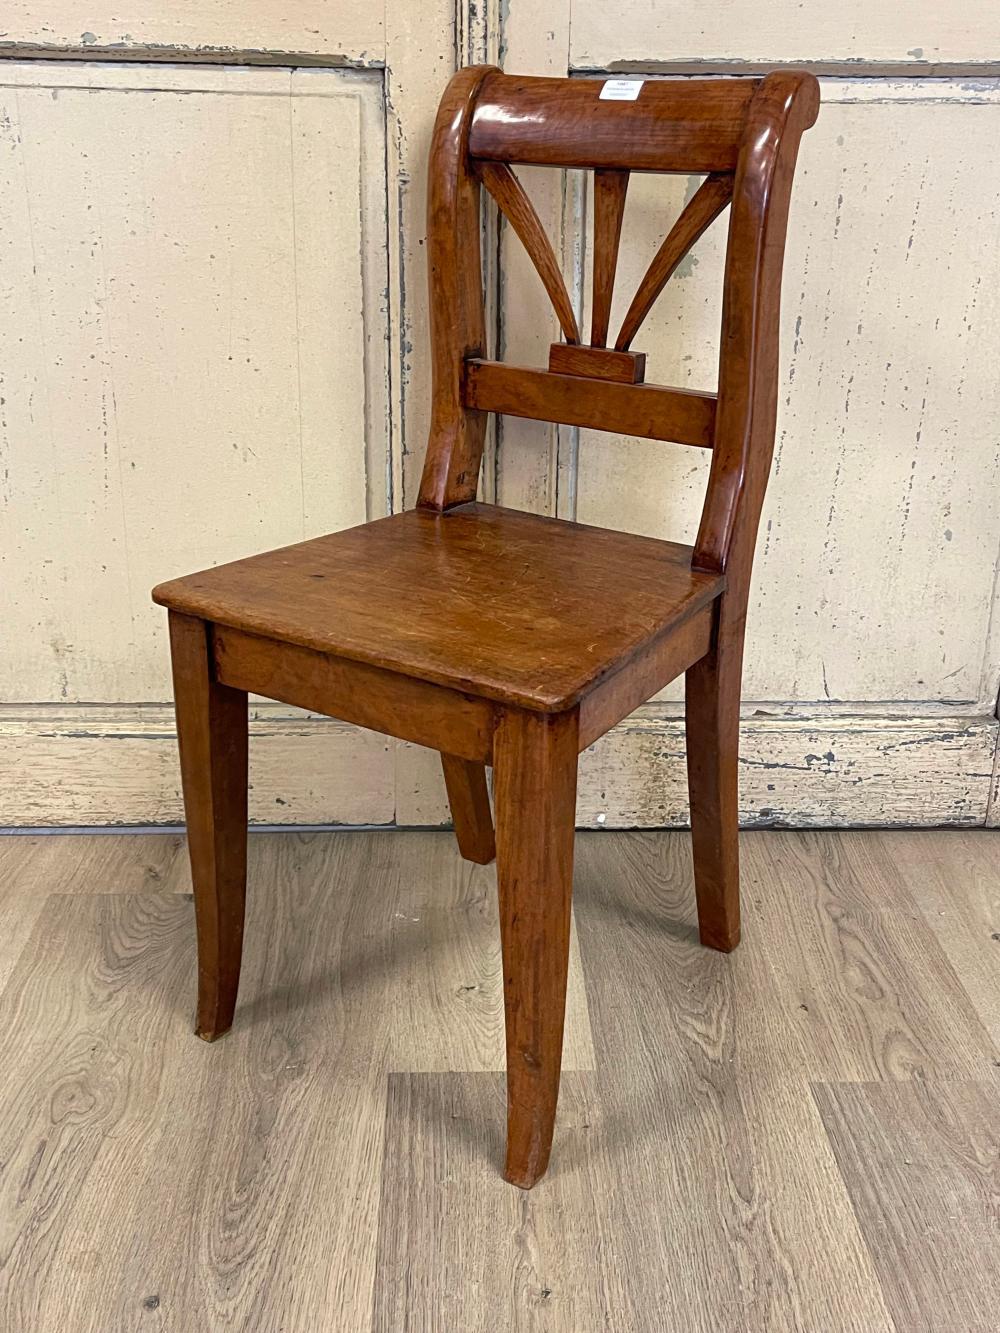 South Australian chair, showing Biedermeier design